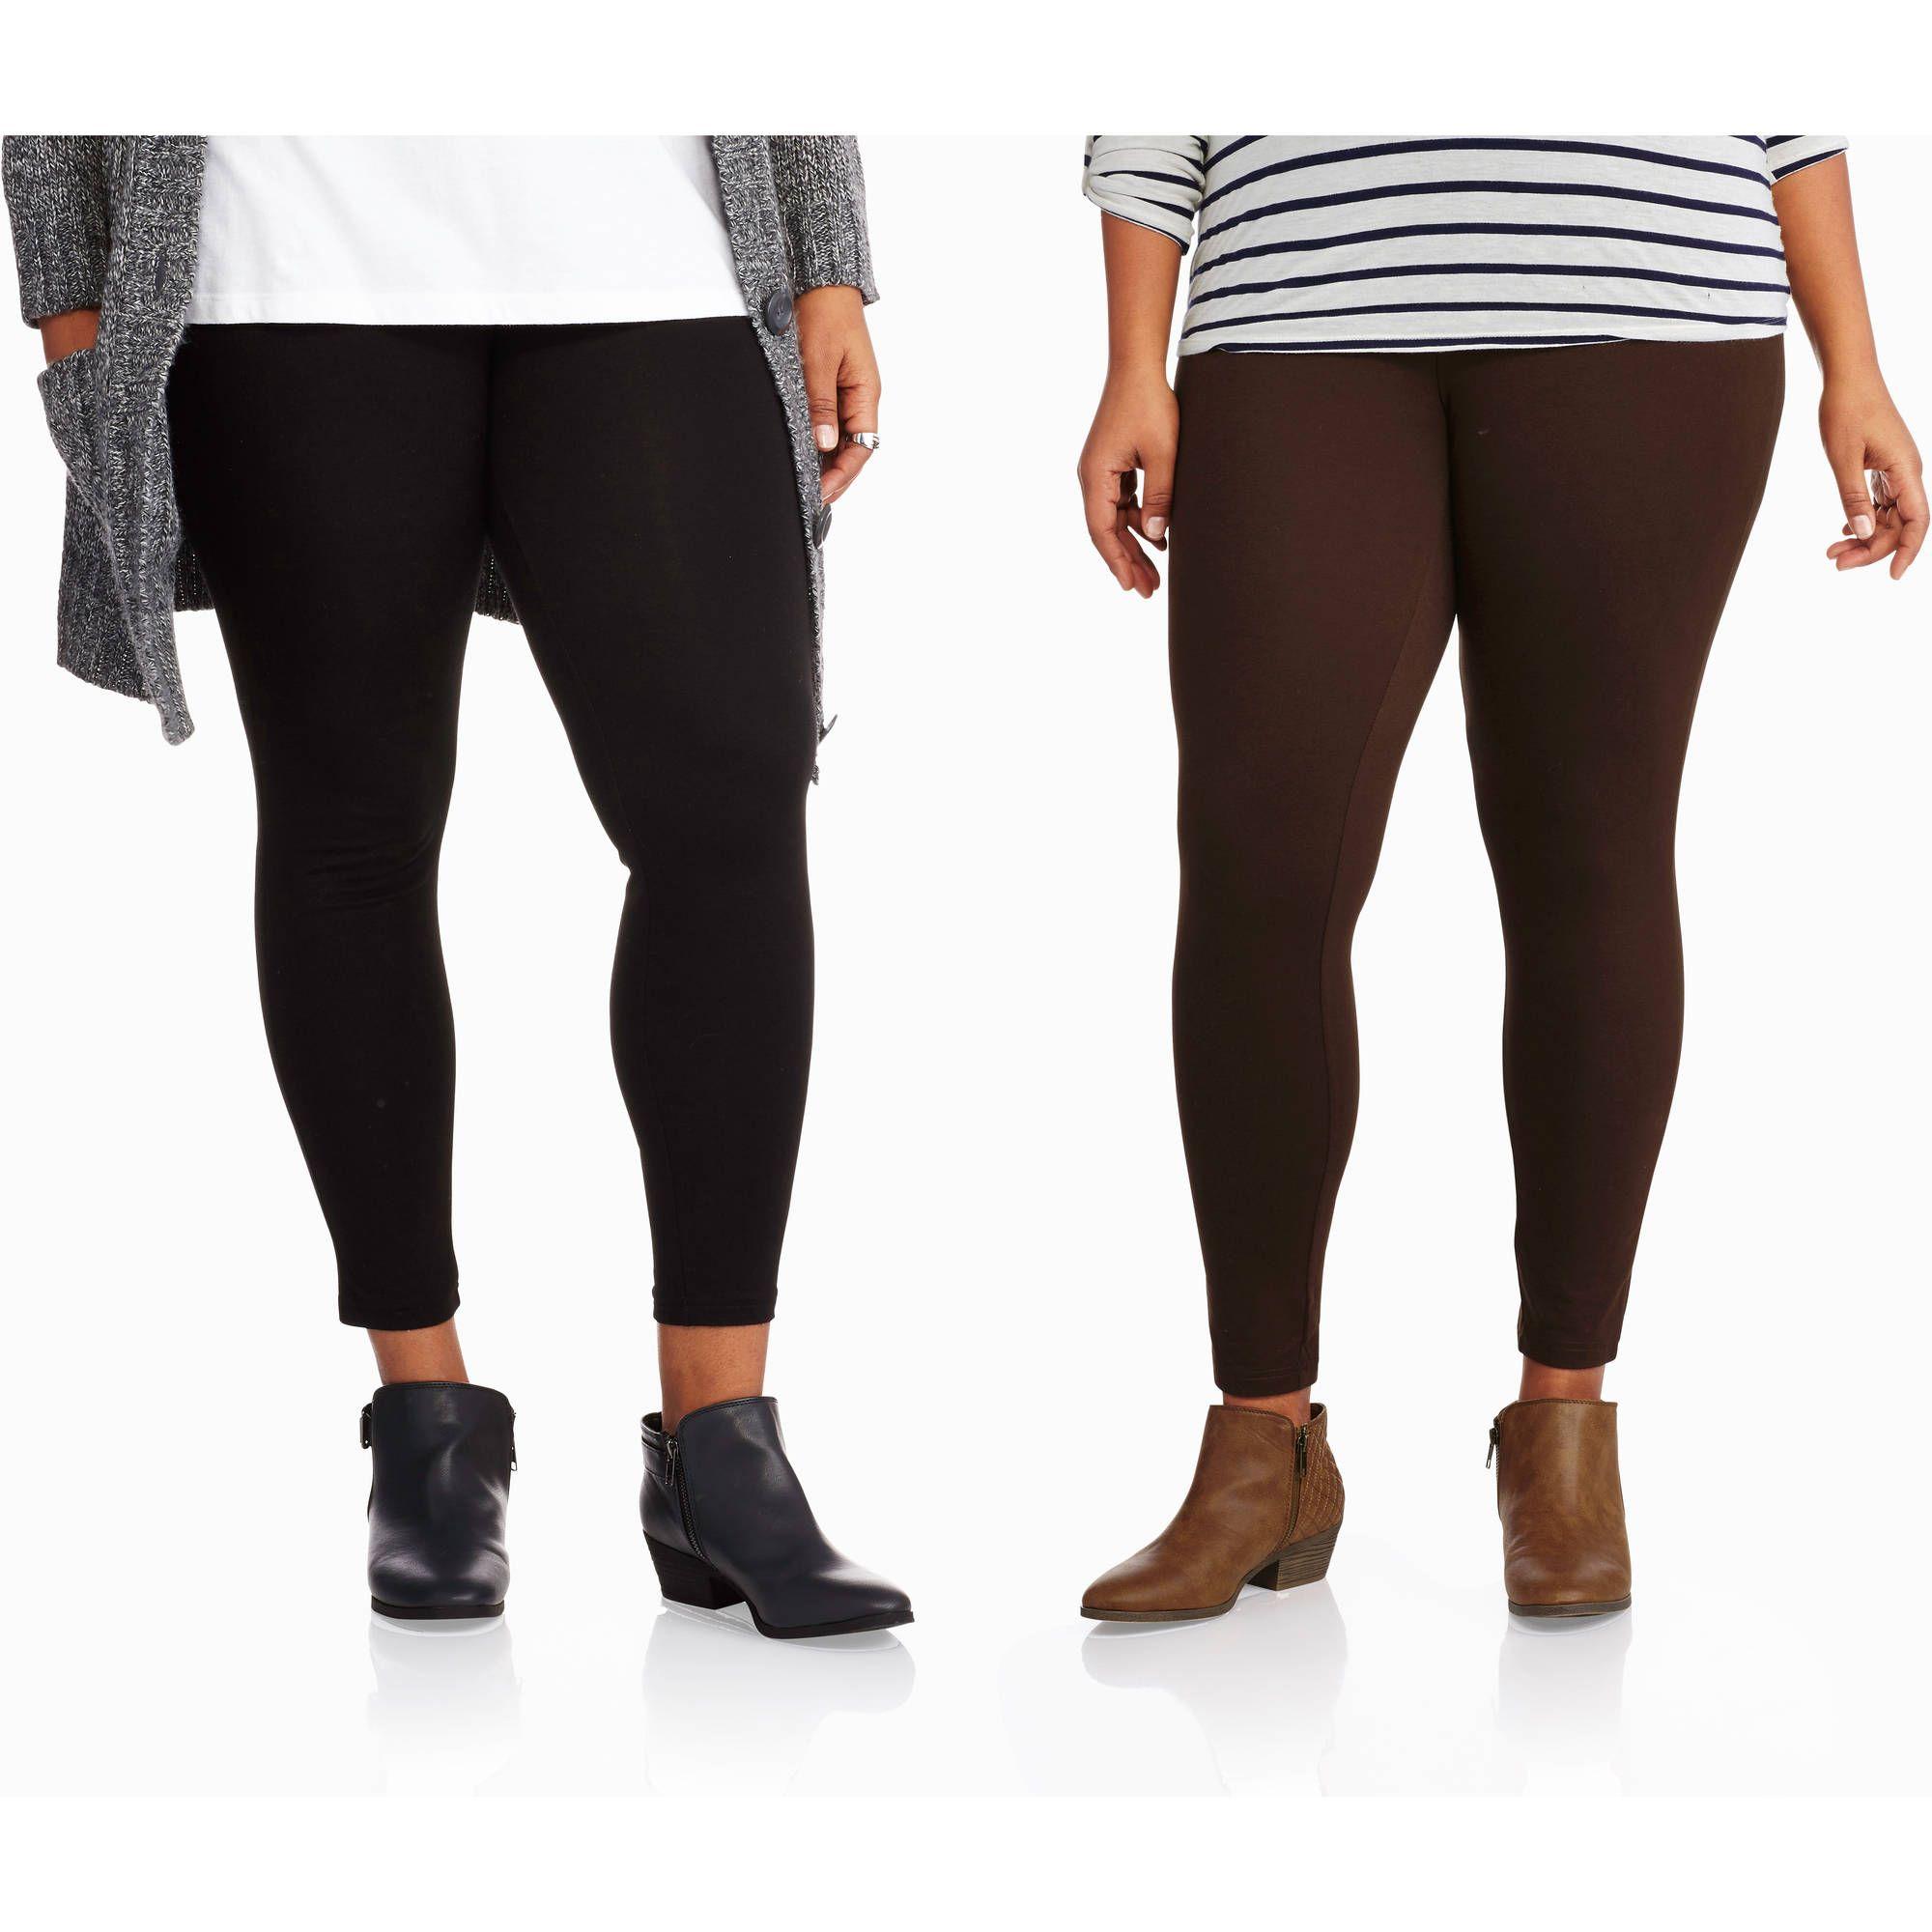 ae2a21ed753 Faded Glory Women s Plus-Size Essential Knit Leggings - Walmart.com ...